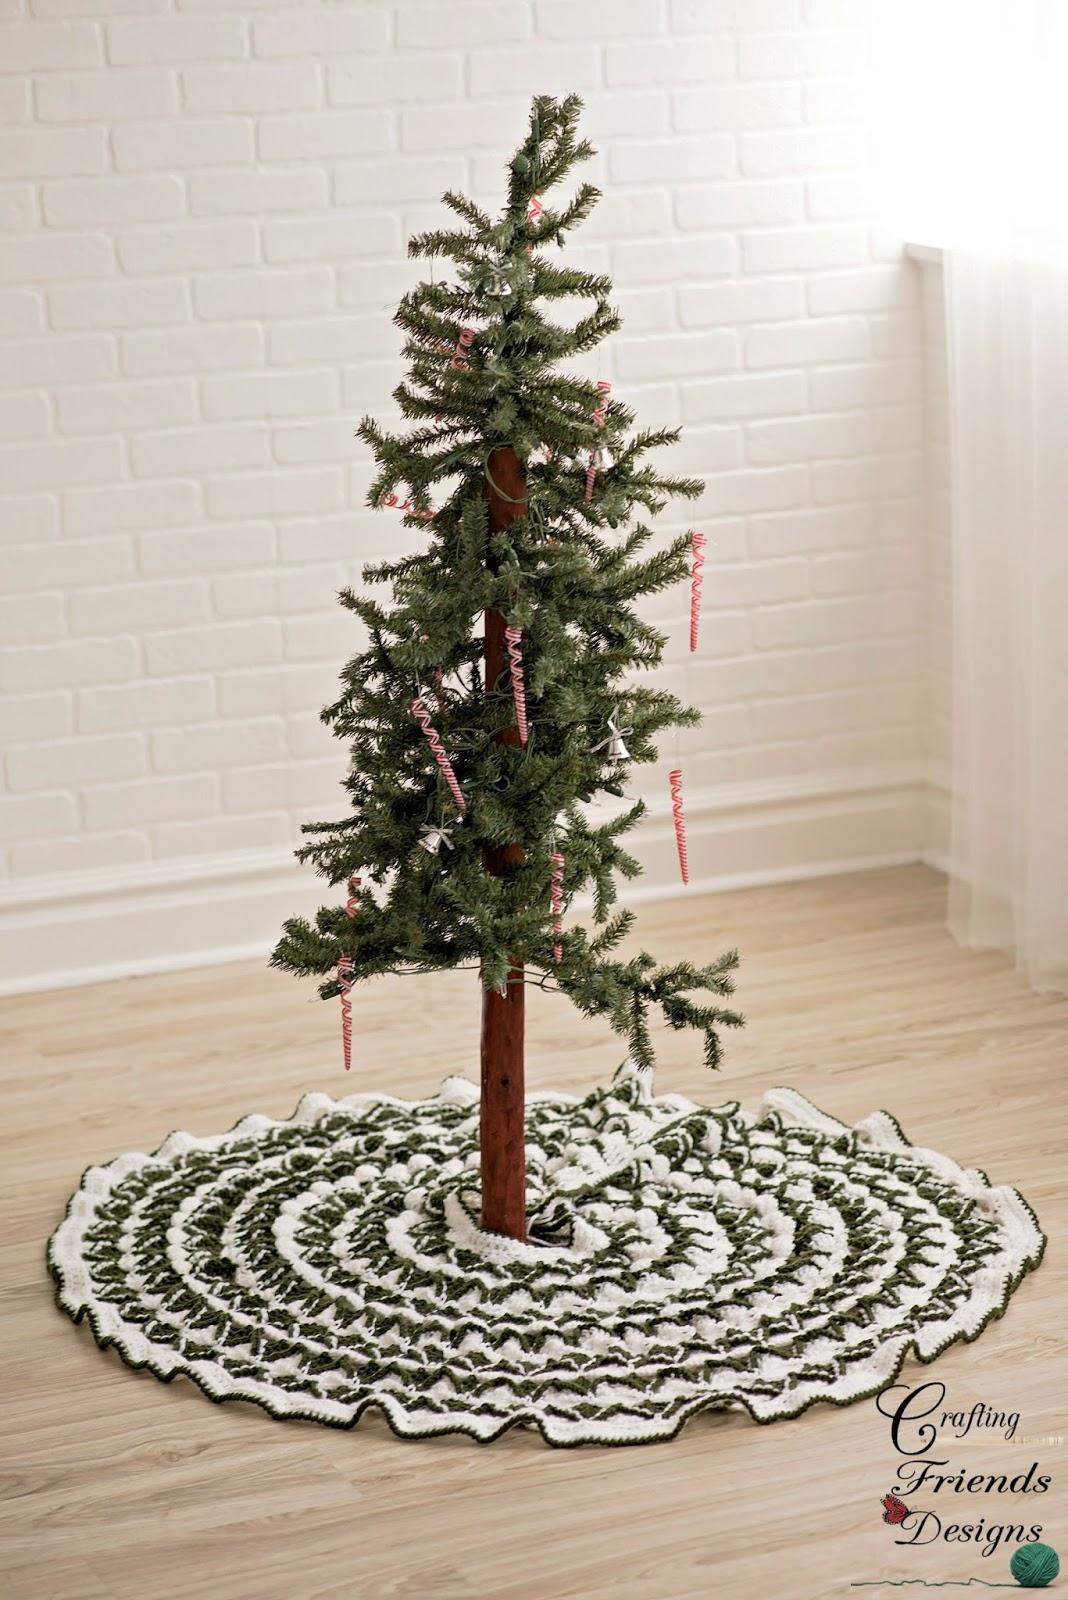 Free Pattern Crochet Tree Skirt : Crafting Friends Designs: Christmas Pine Tree Skirt Free ...